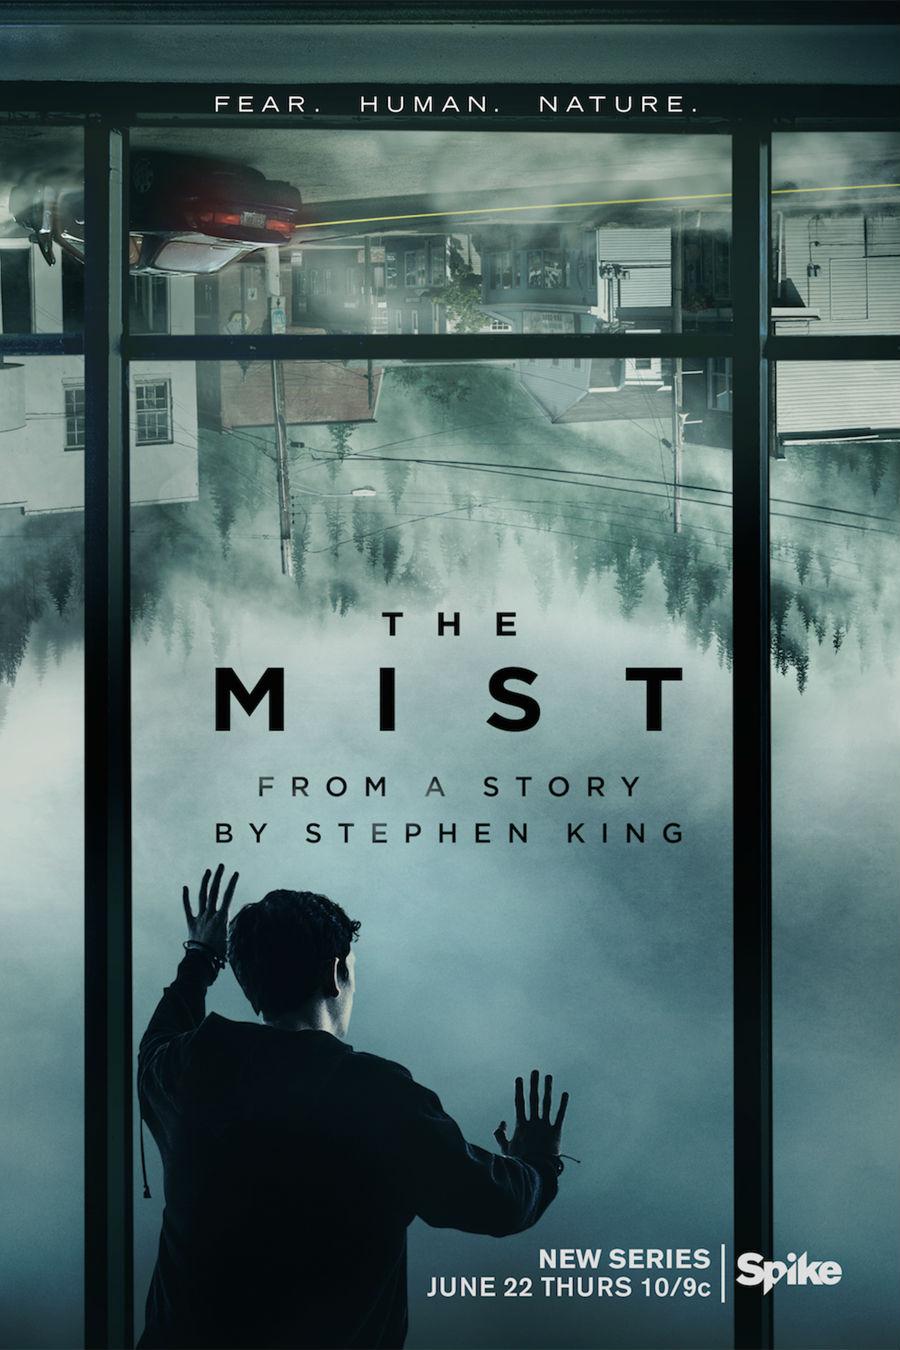 The Mist - Christian Torpe